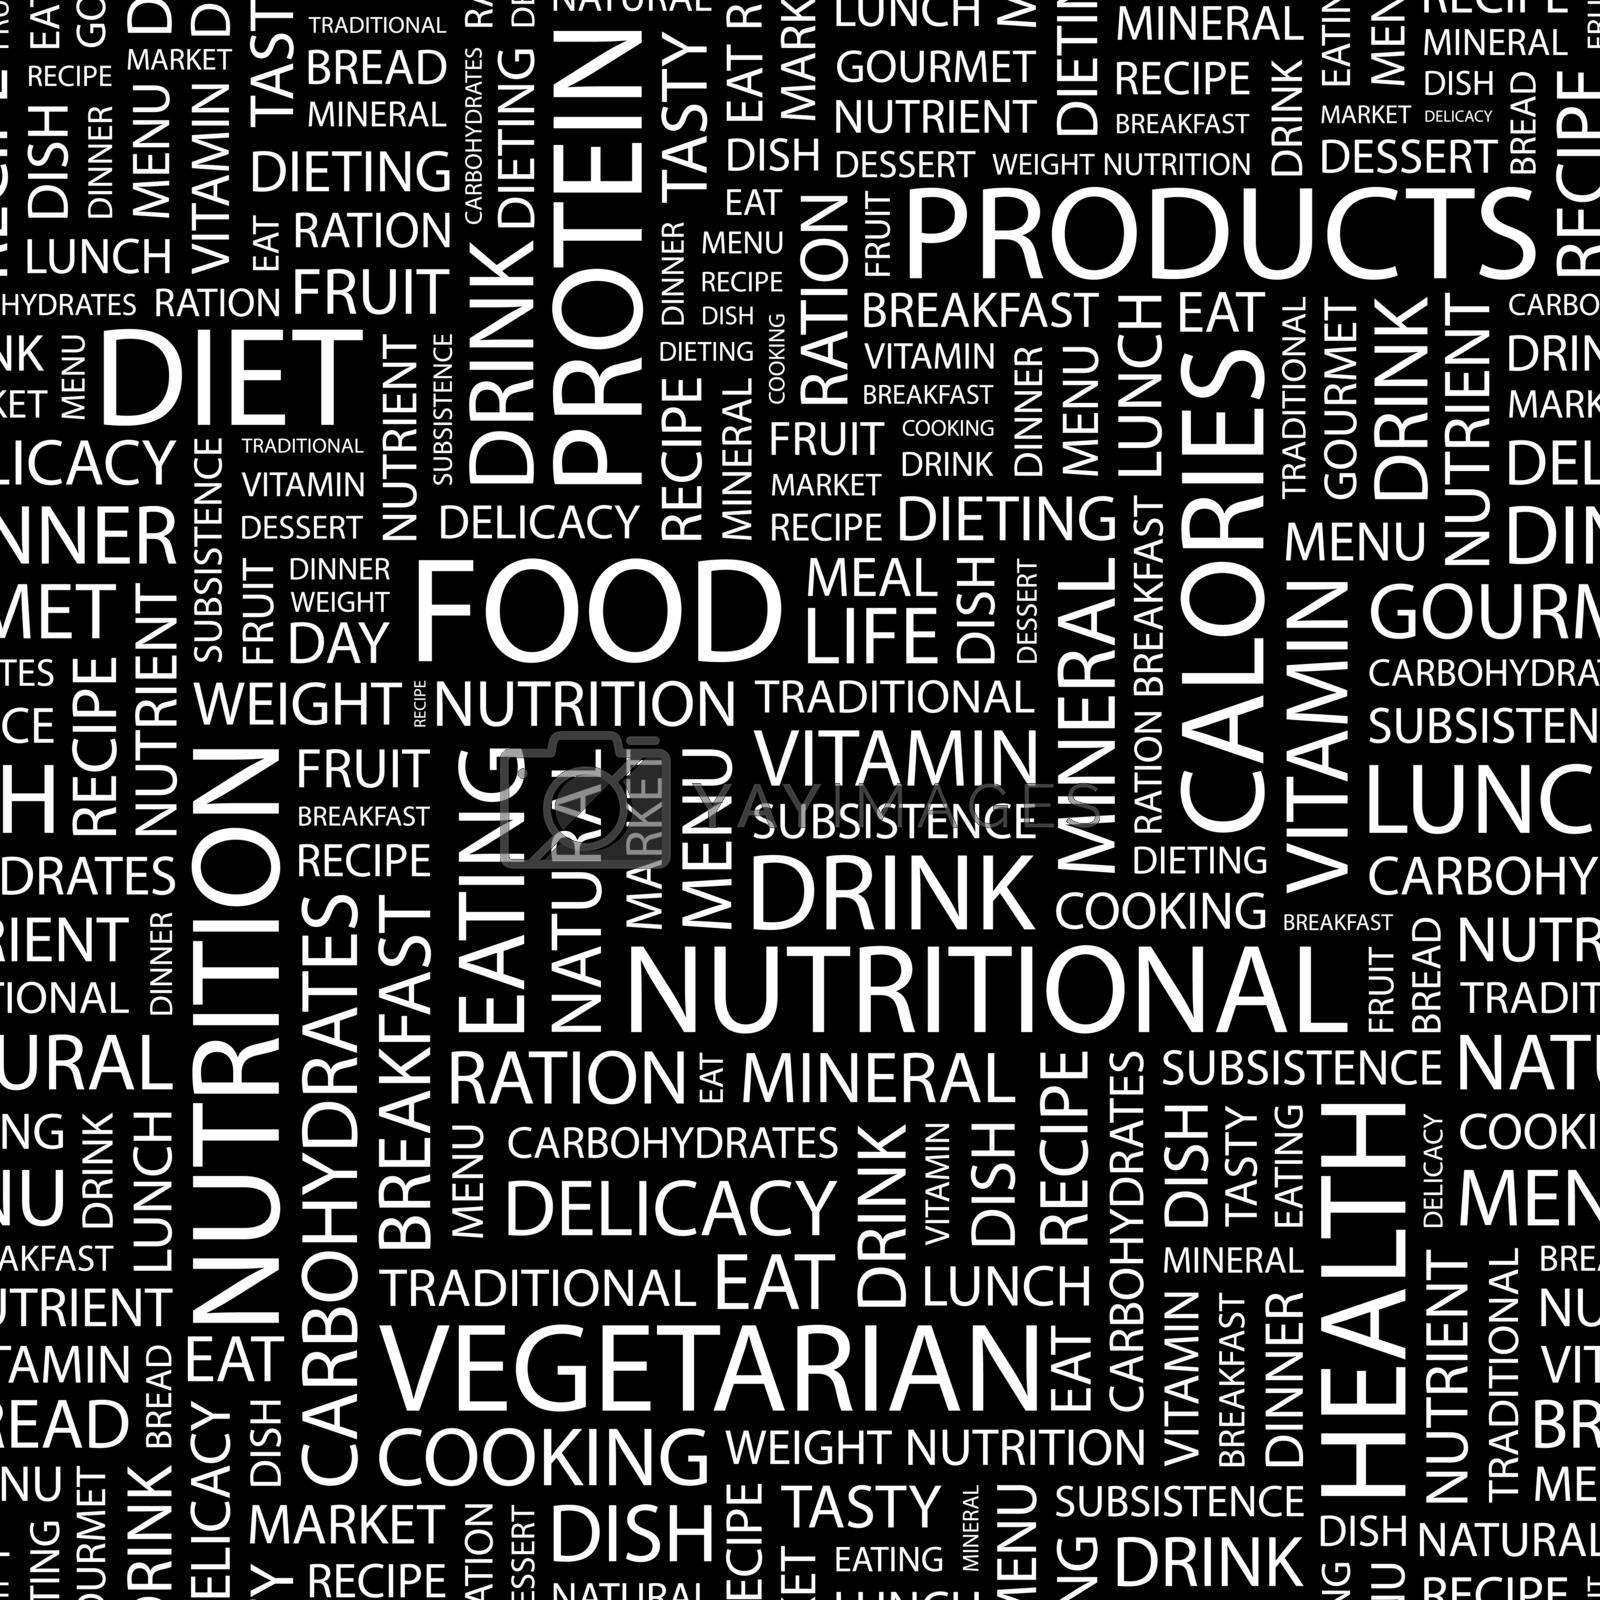 FOOD. Seamless pattern. Word cloud illustration.